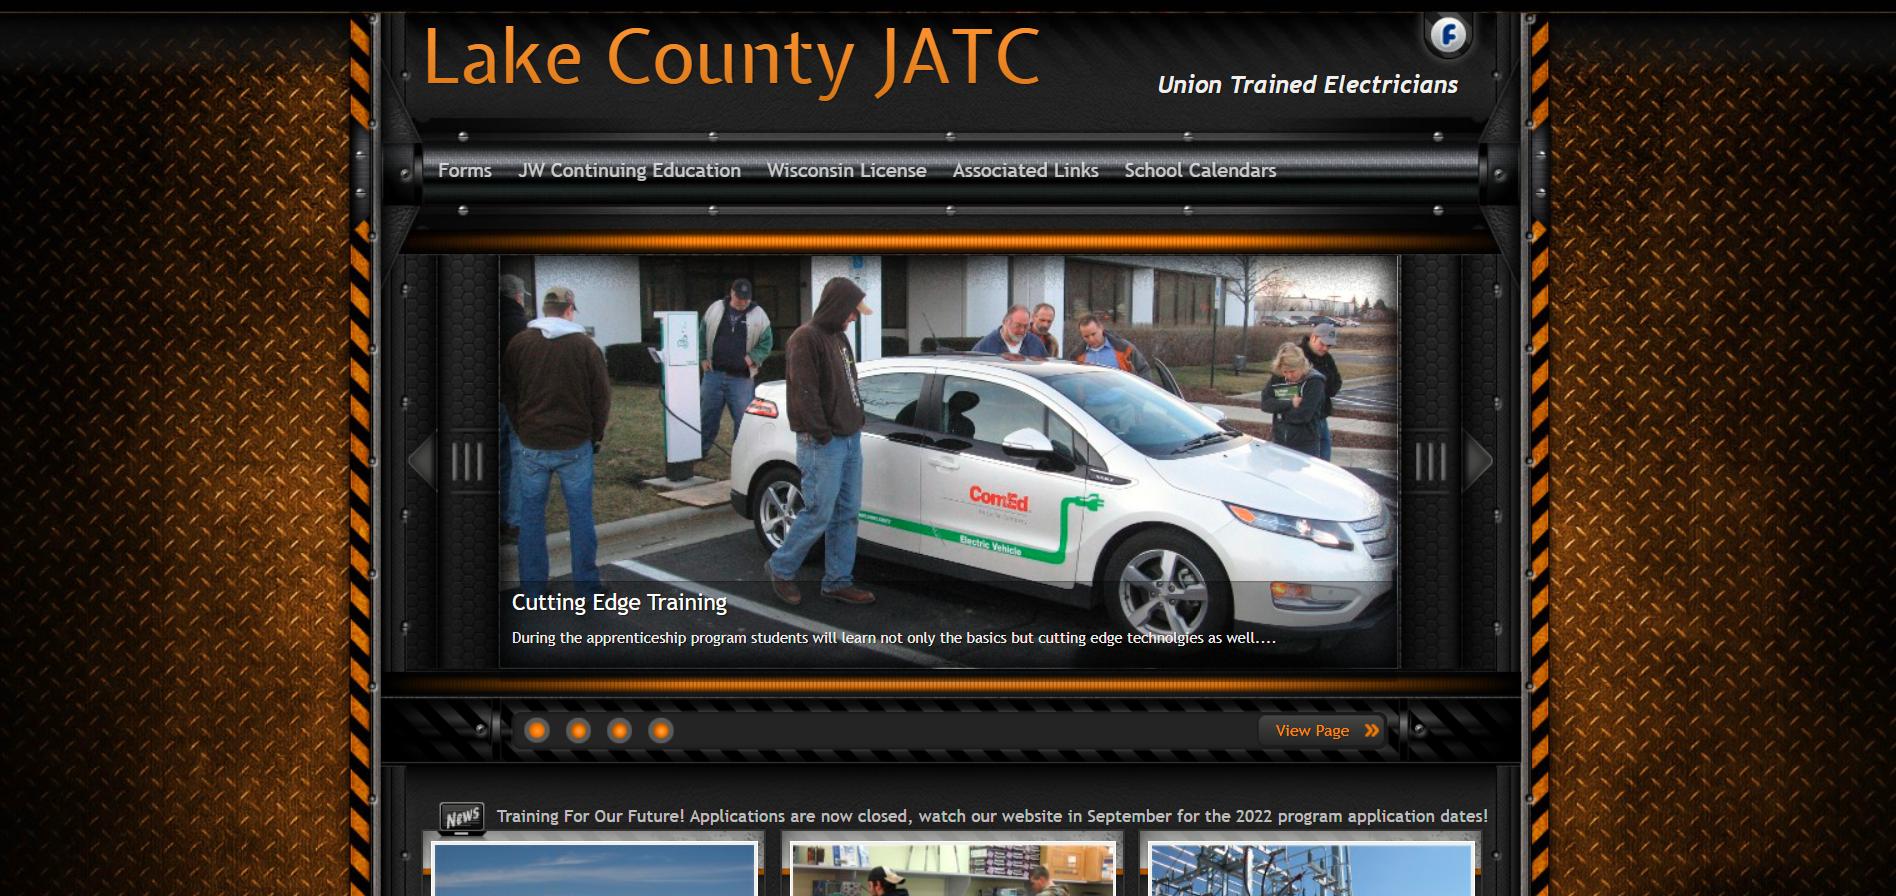 lake county jatc